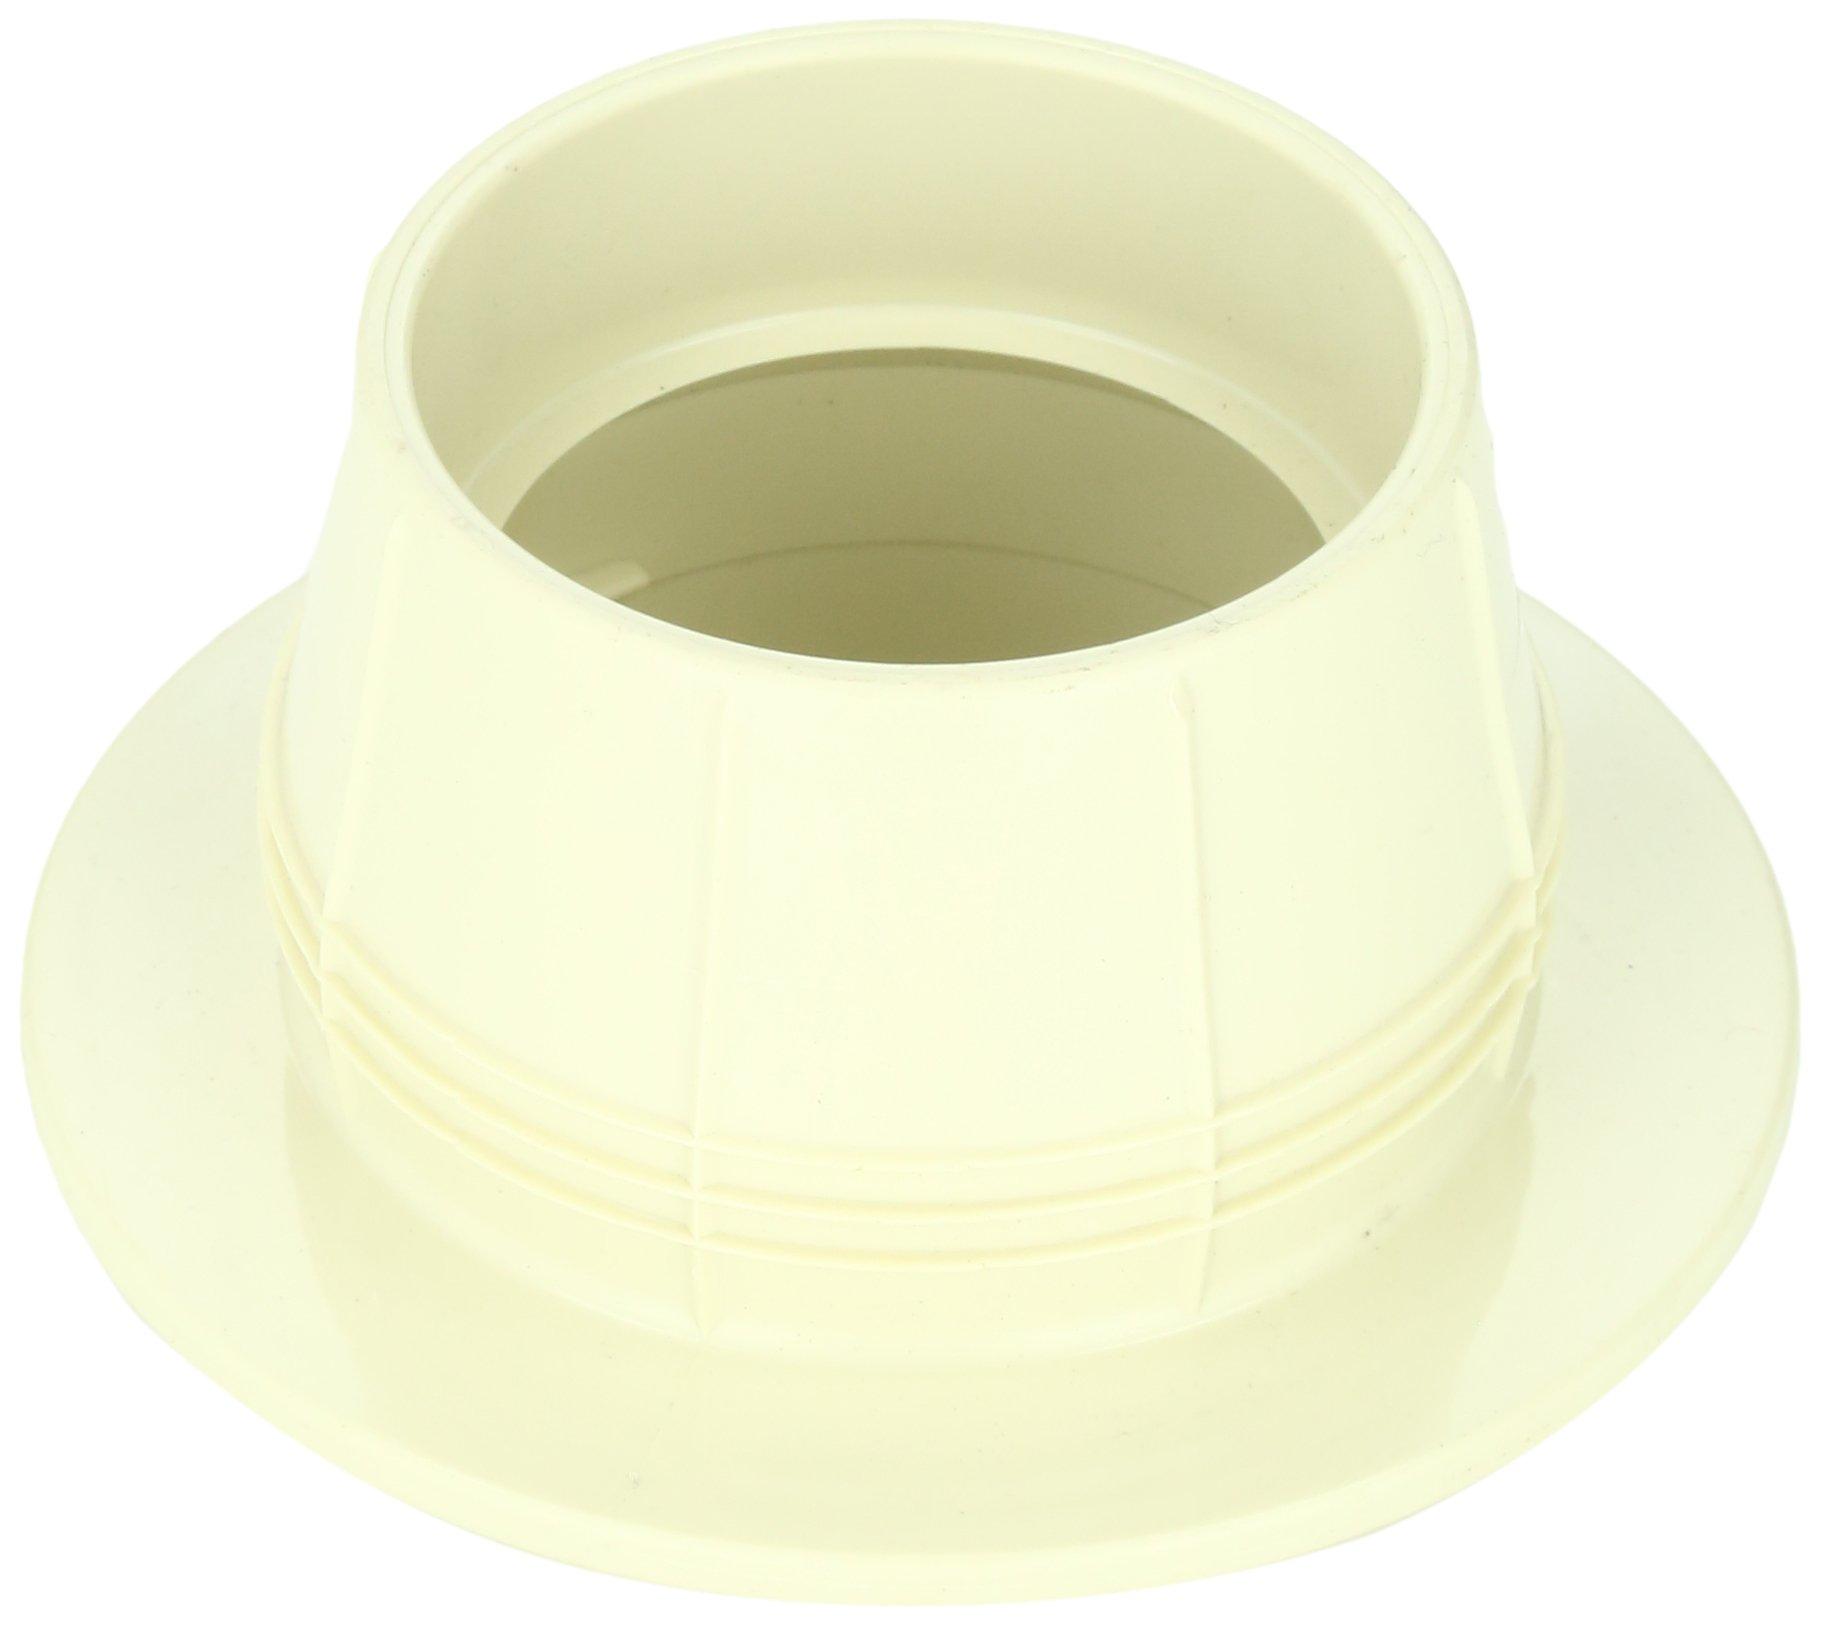 Zodiac UltraFlex2 Collar, Light Cream